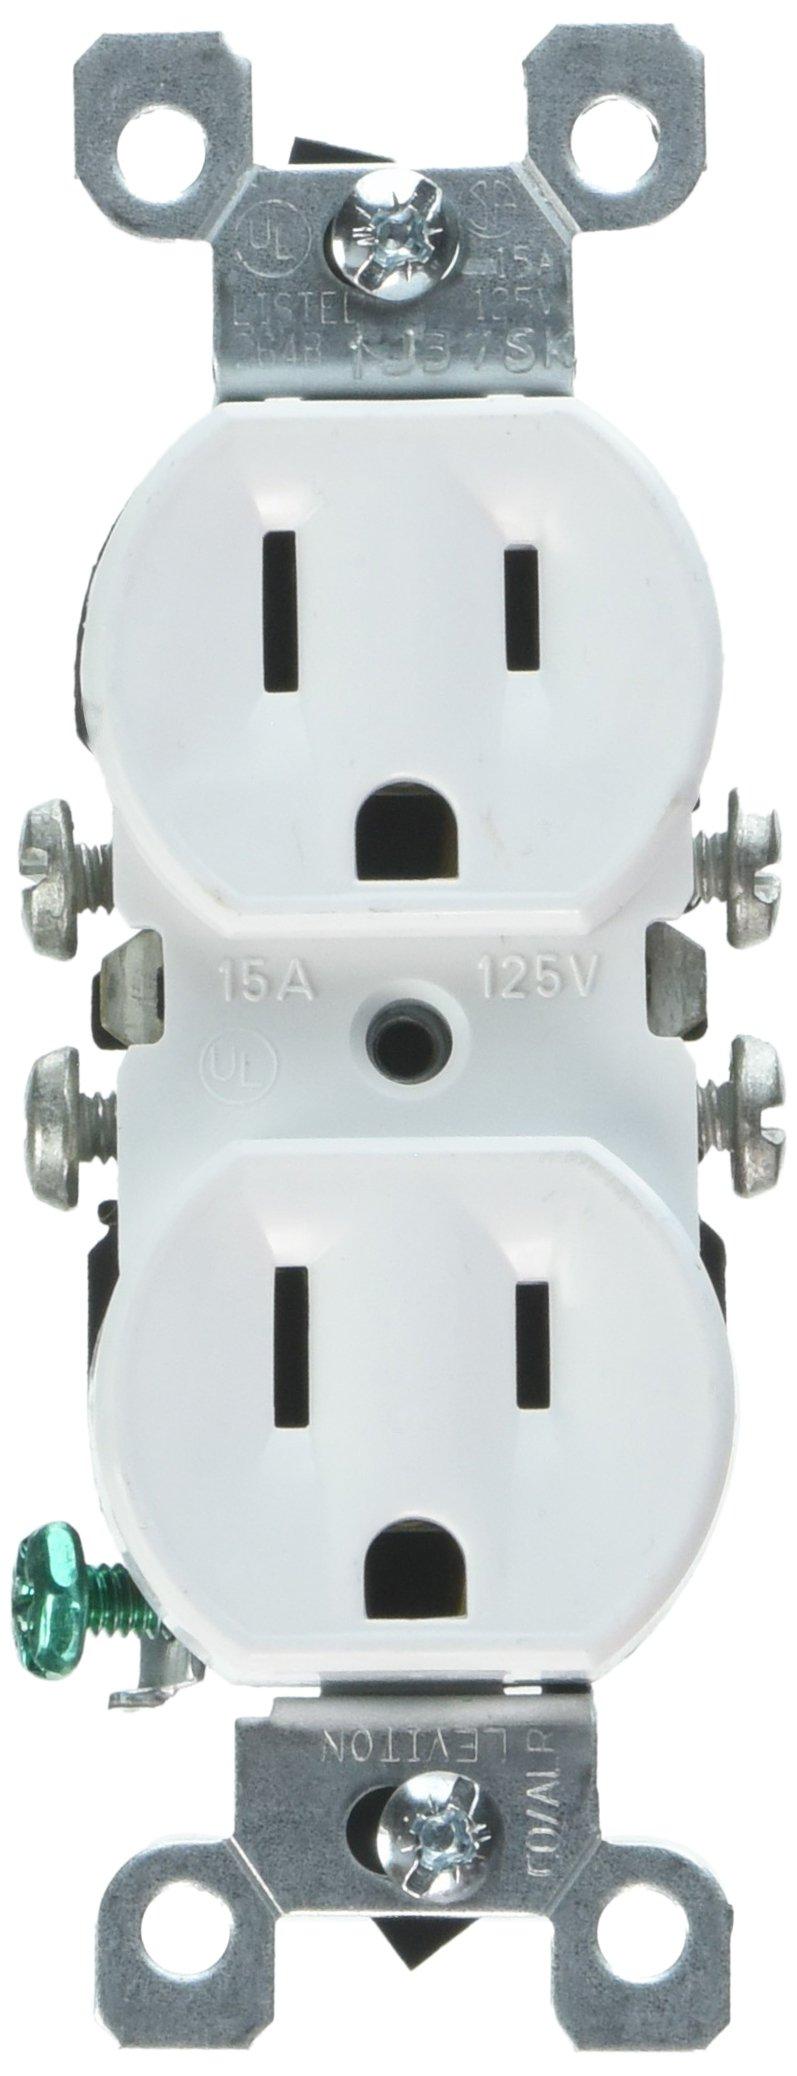 Leviton 12650-W 15 Amp, 125V, Co/ALR Duplex Receptacle, Straight Blade, Residential Grade, Grounding, 10-Pack, White